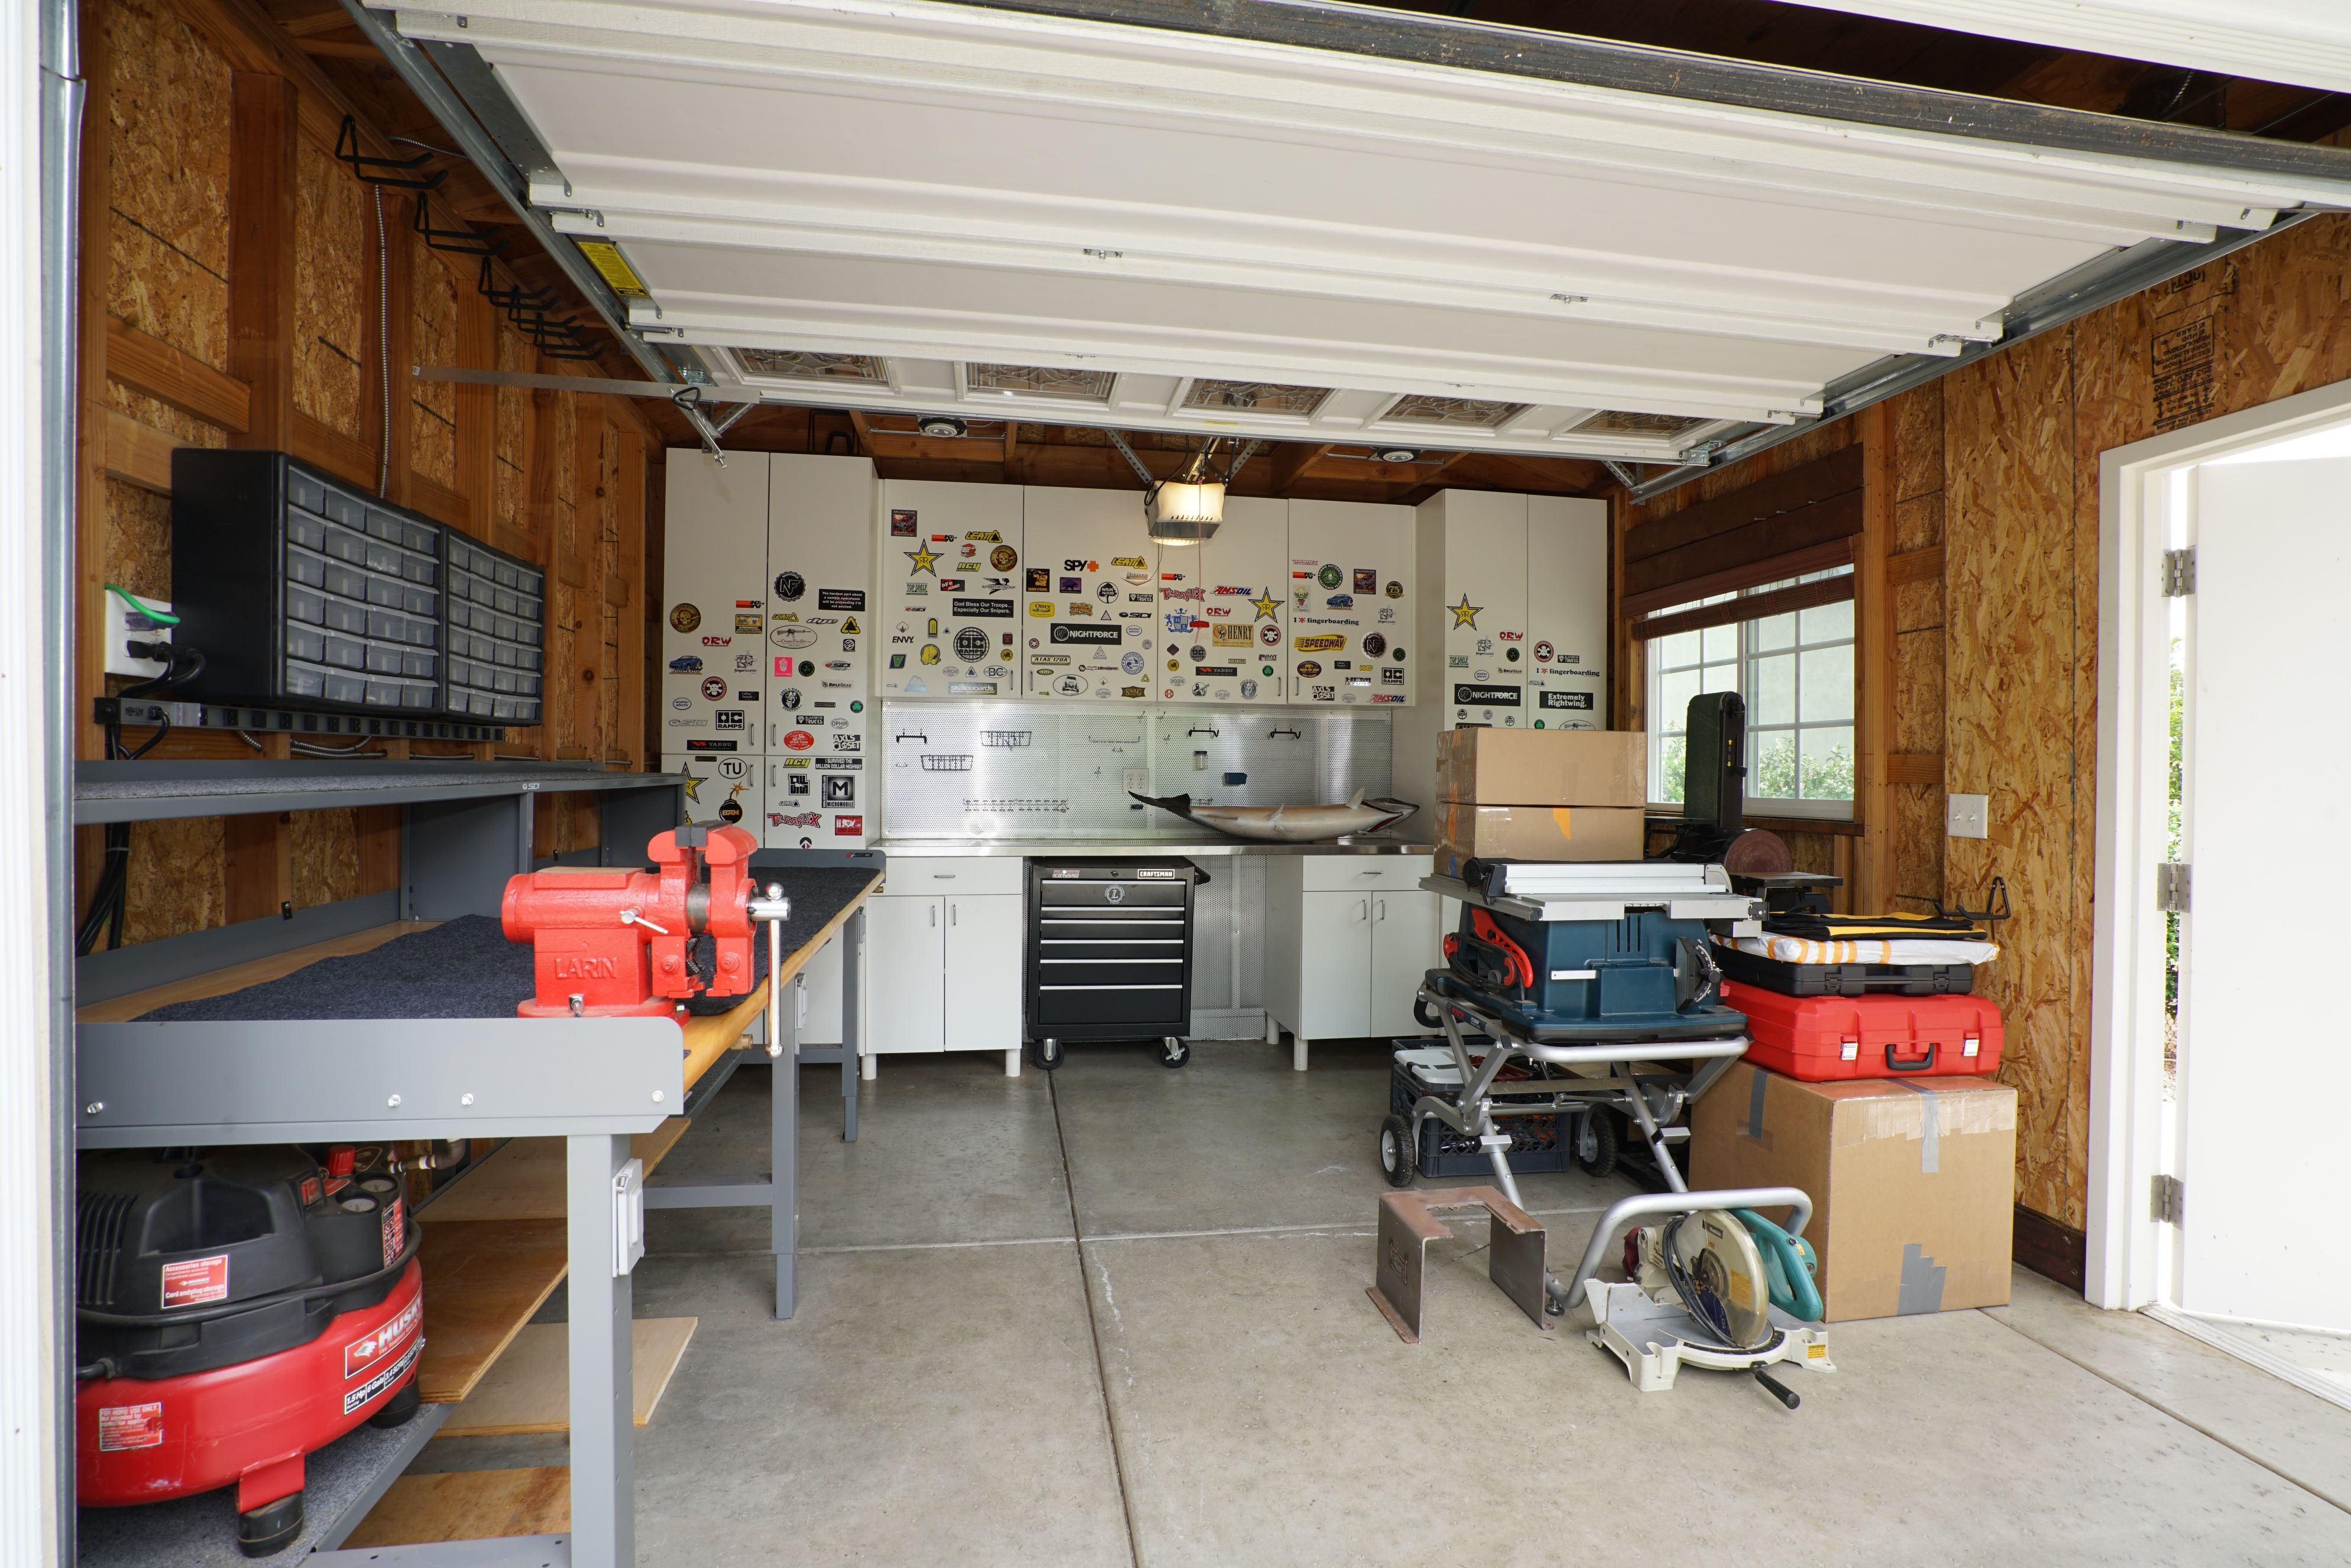 Upper Yard Shed and Workshop Interior